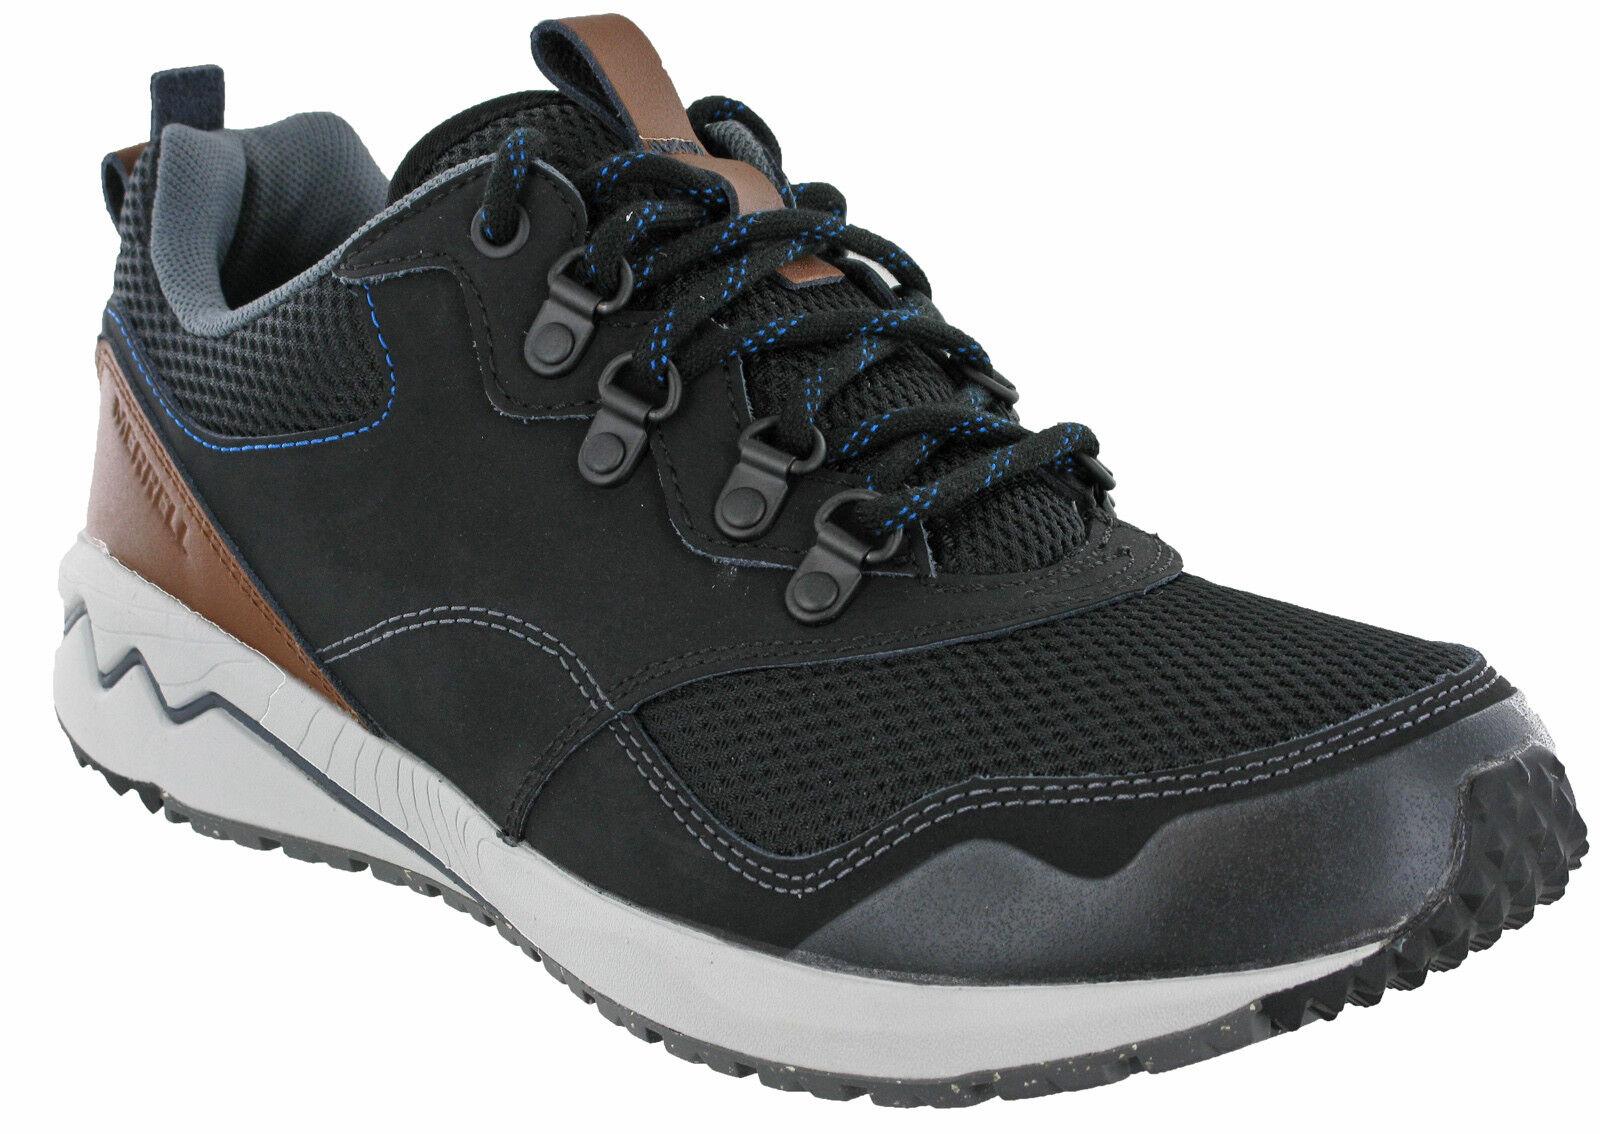 Merrell Stowe Trainers Leder Mesh Walking   Walking Herren Lace Up Casual Turnschuhe Schuhes 3cd699